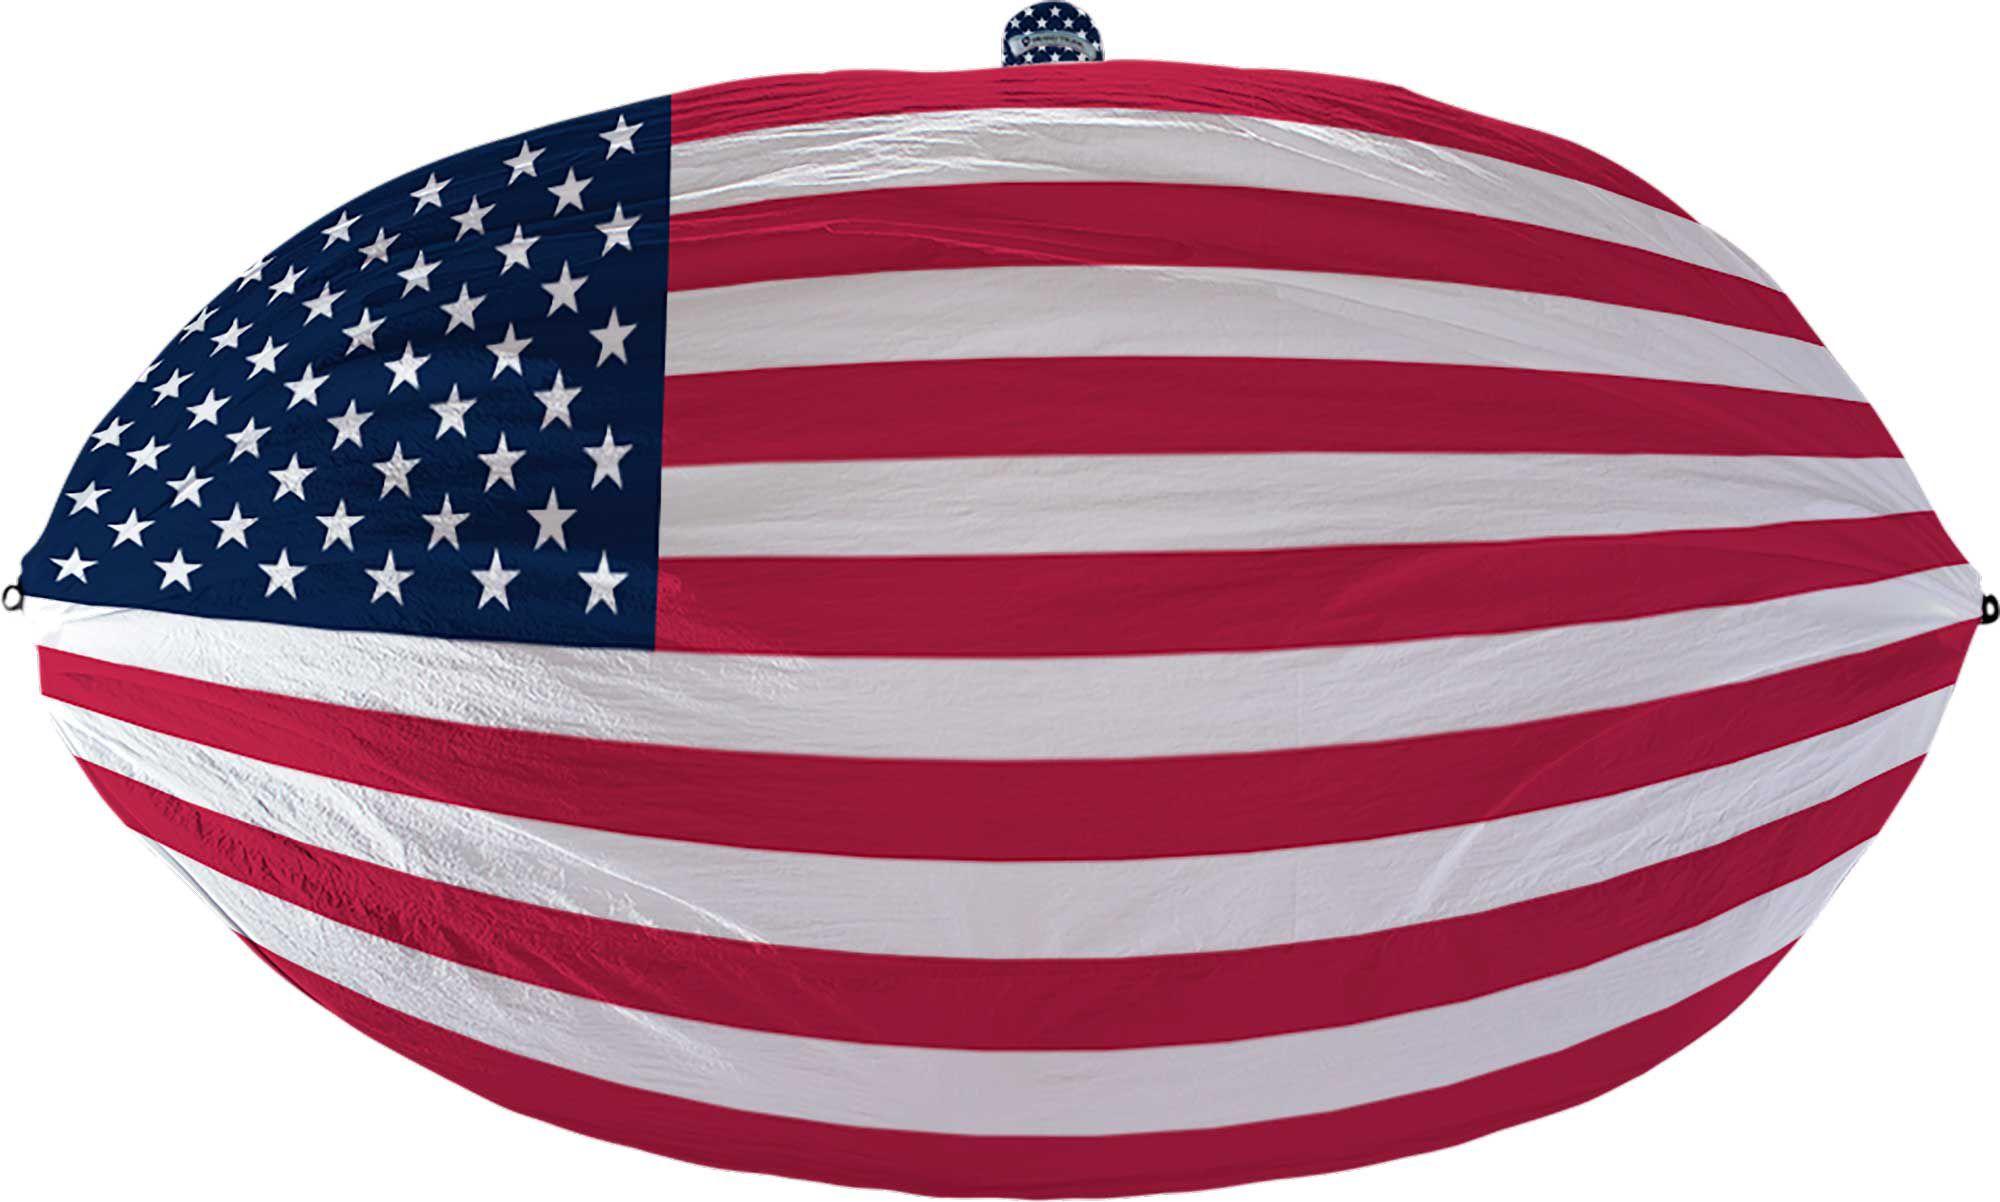 noimagefound     grand trunk usa flag hammock   dick u0027s sporting goods  rh   dickssportinggoods